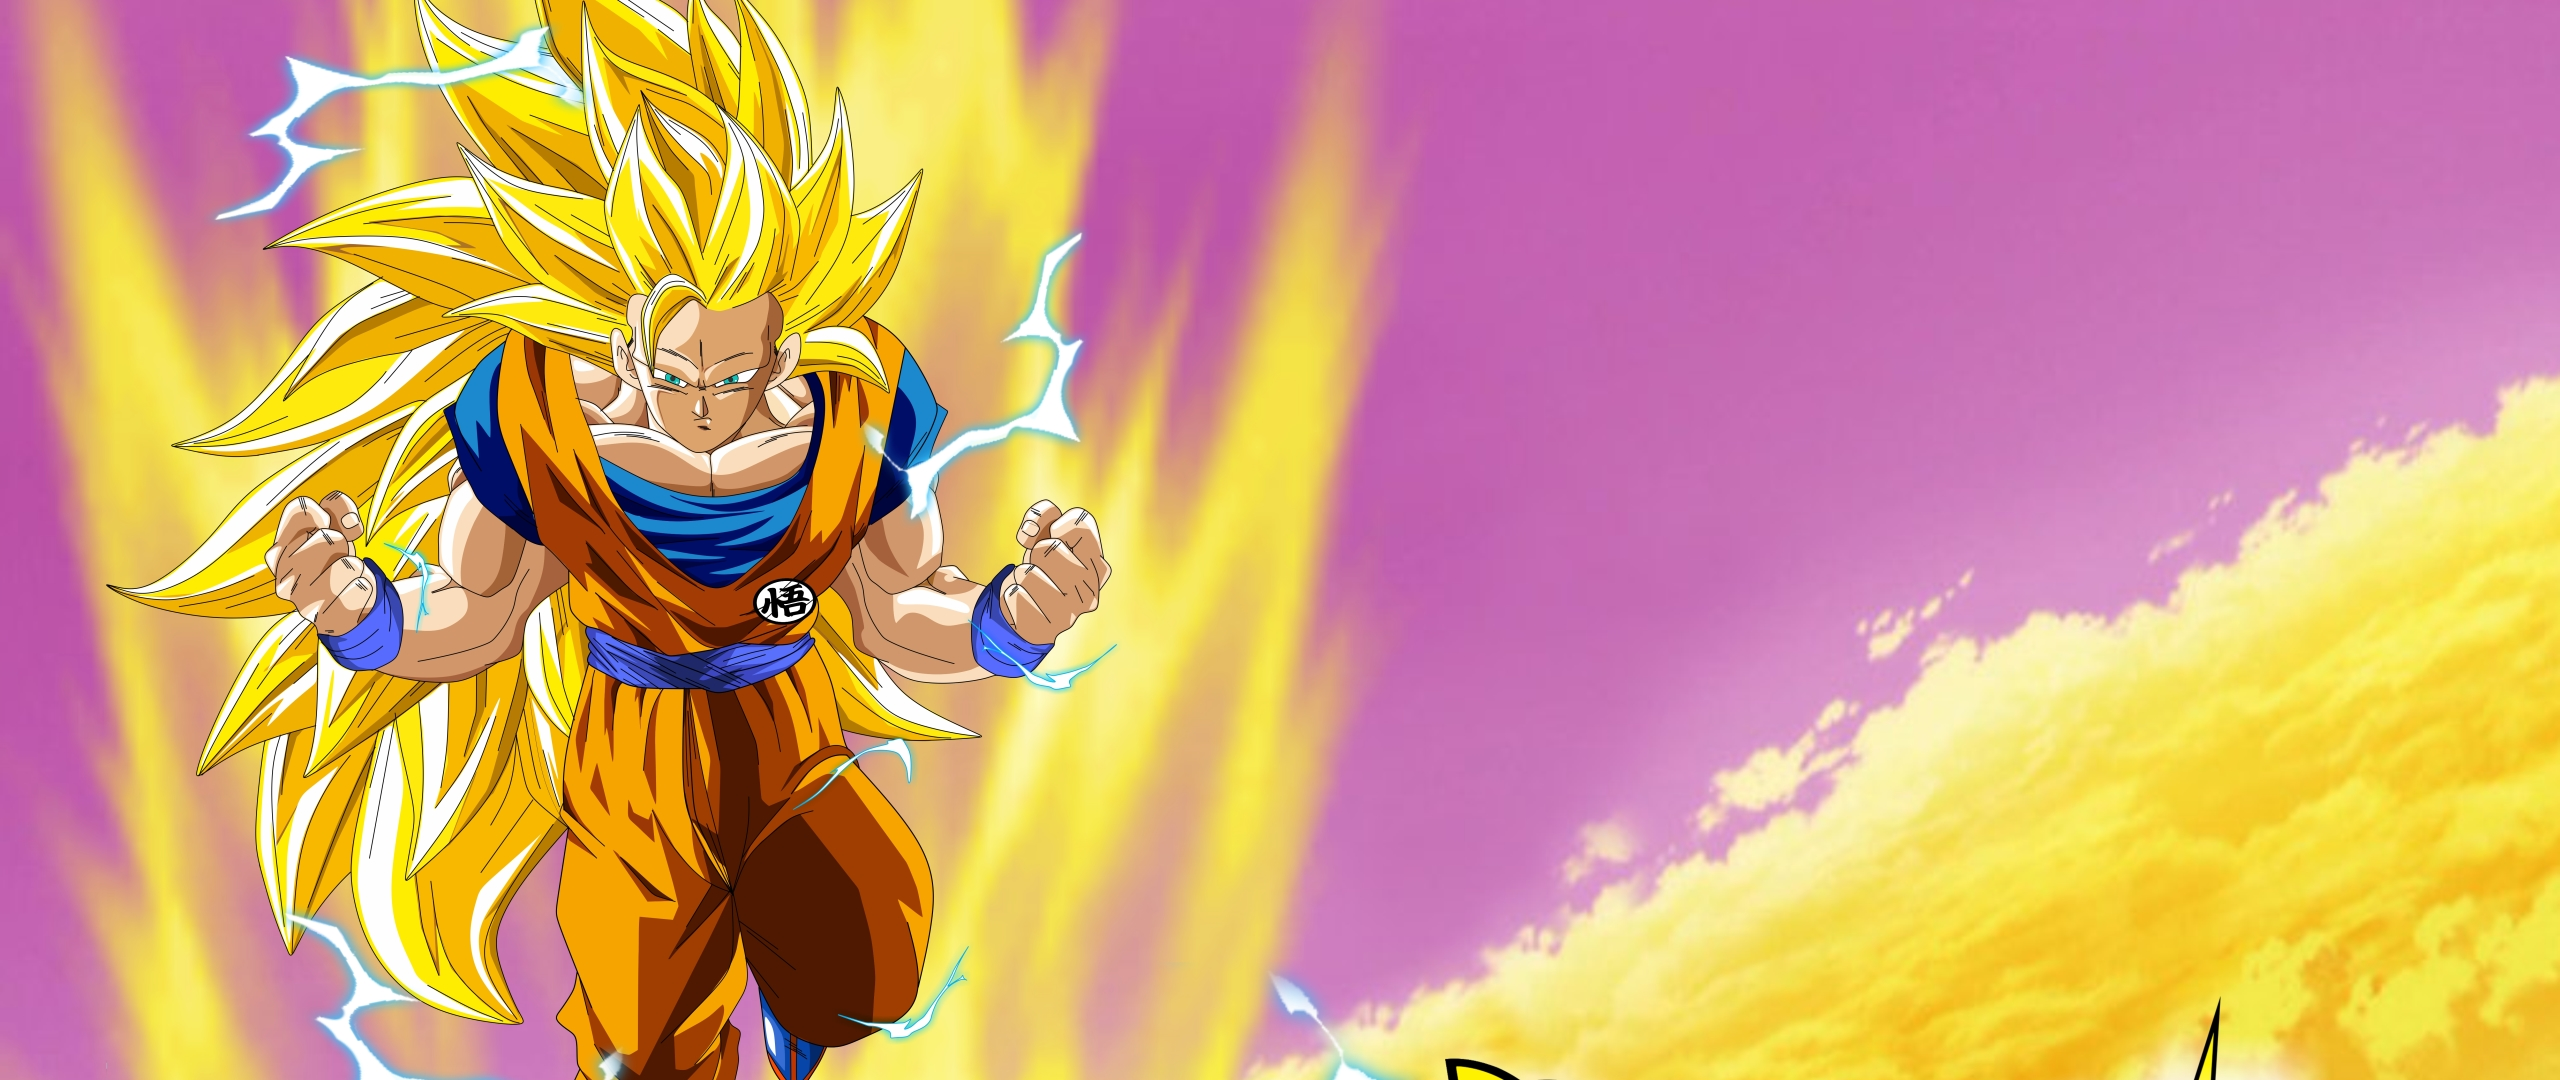 Download Goku, Dragon Ball Super, Super Saiyan 3 320x480